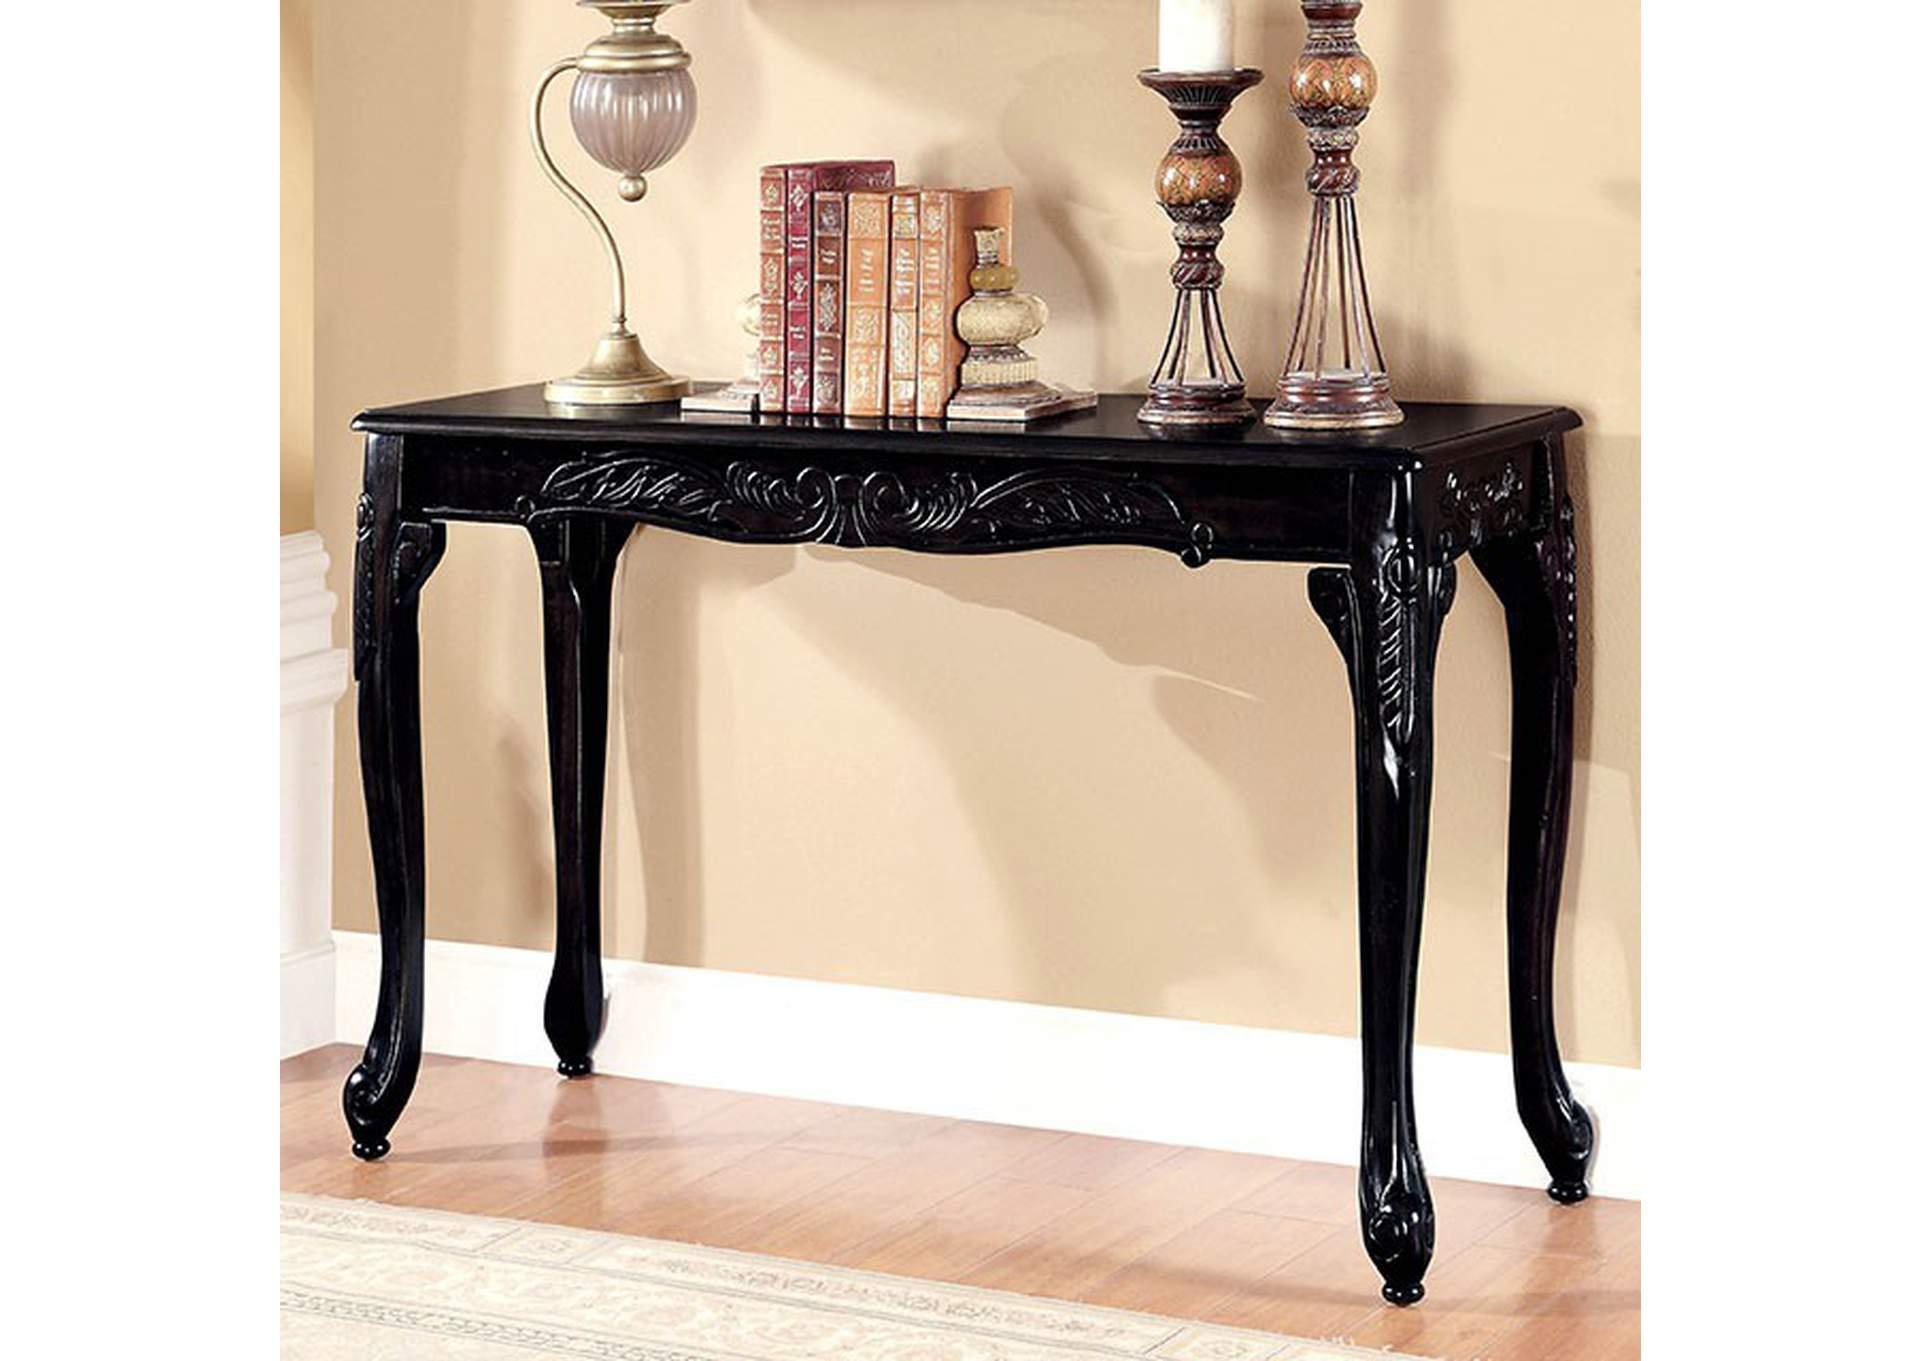 Furniture MOC Cheshire Black Sofa Table